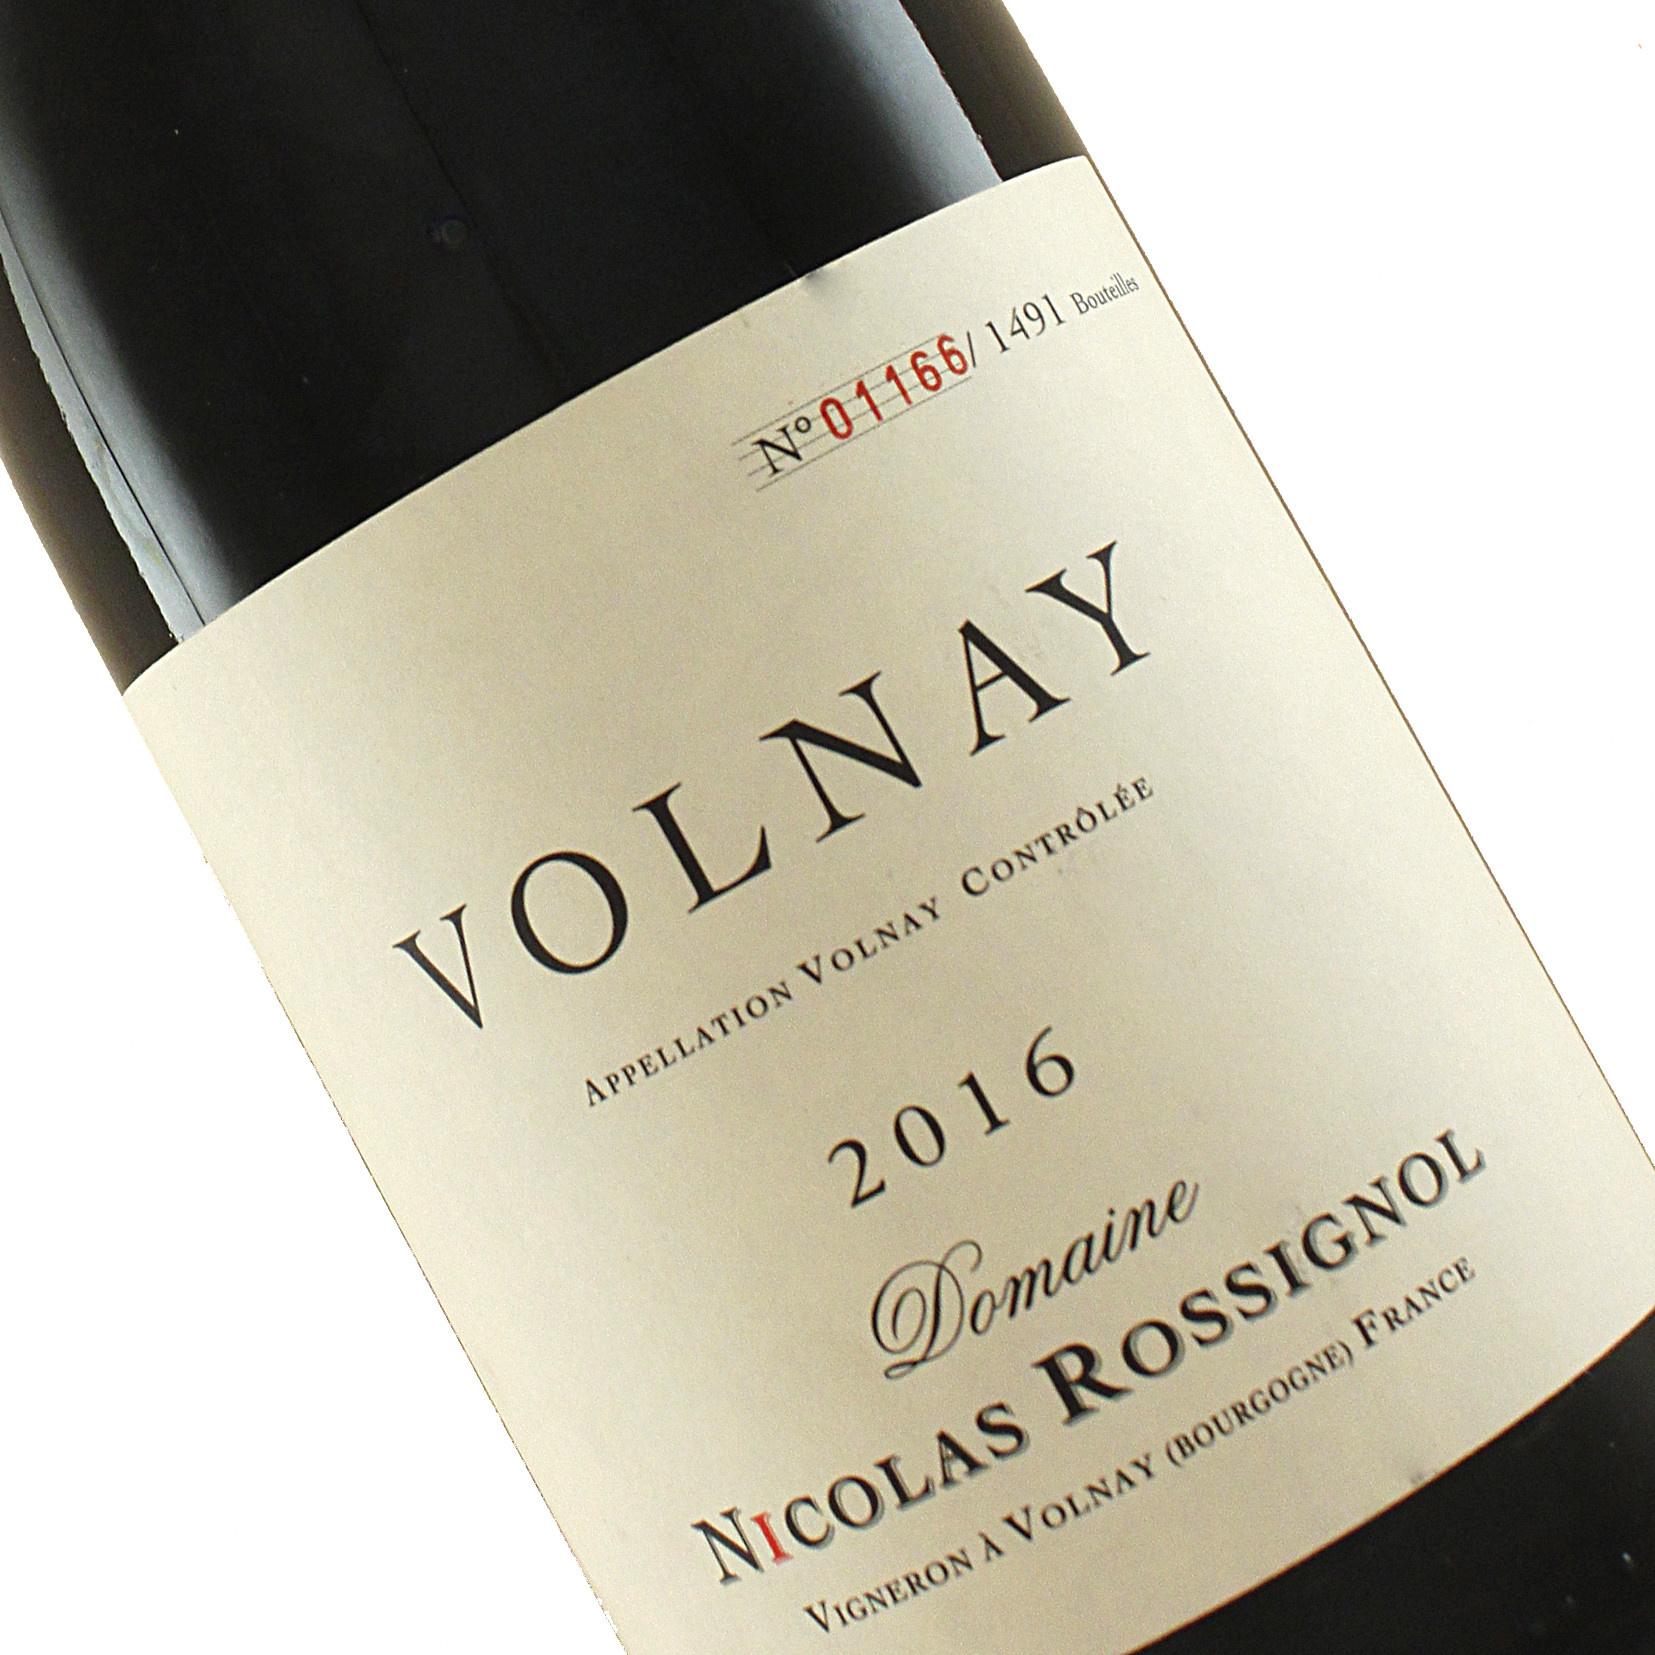 Domaine Nicolas Rossignol 2016 Volnay, Burgundy